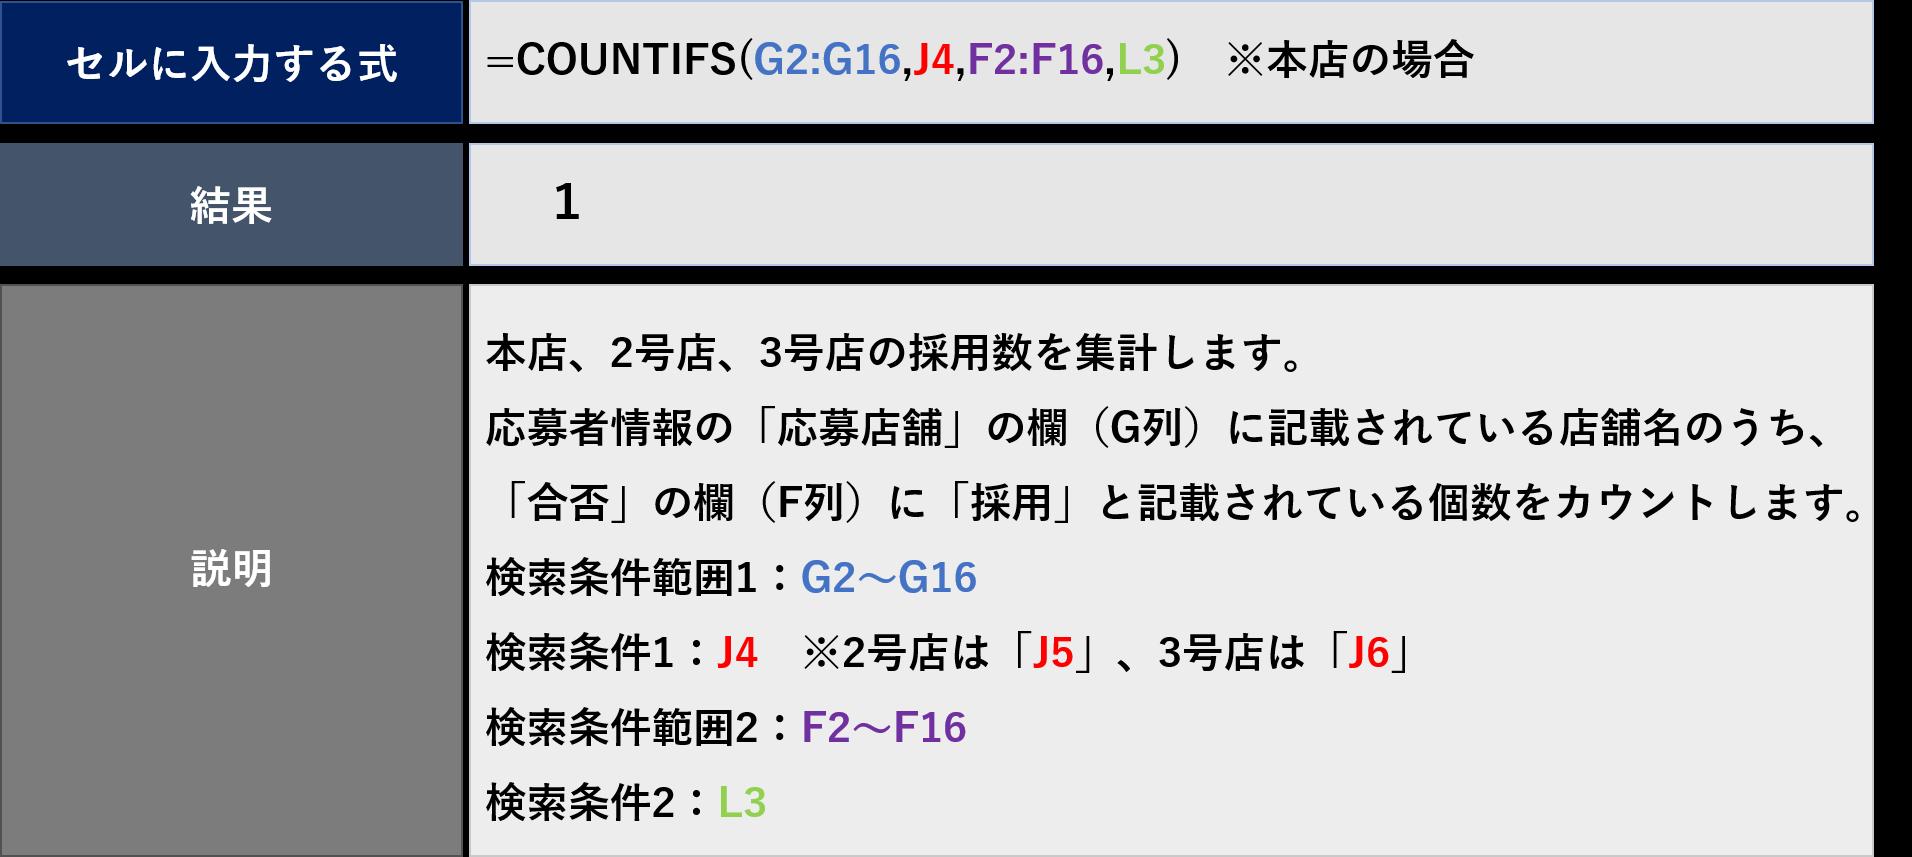 COUNTIFS使用例